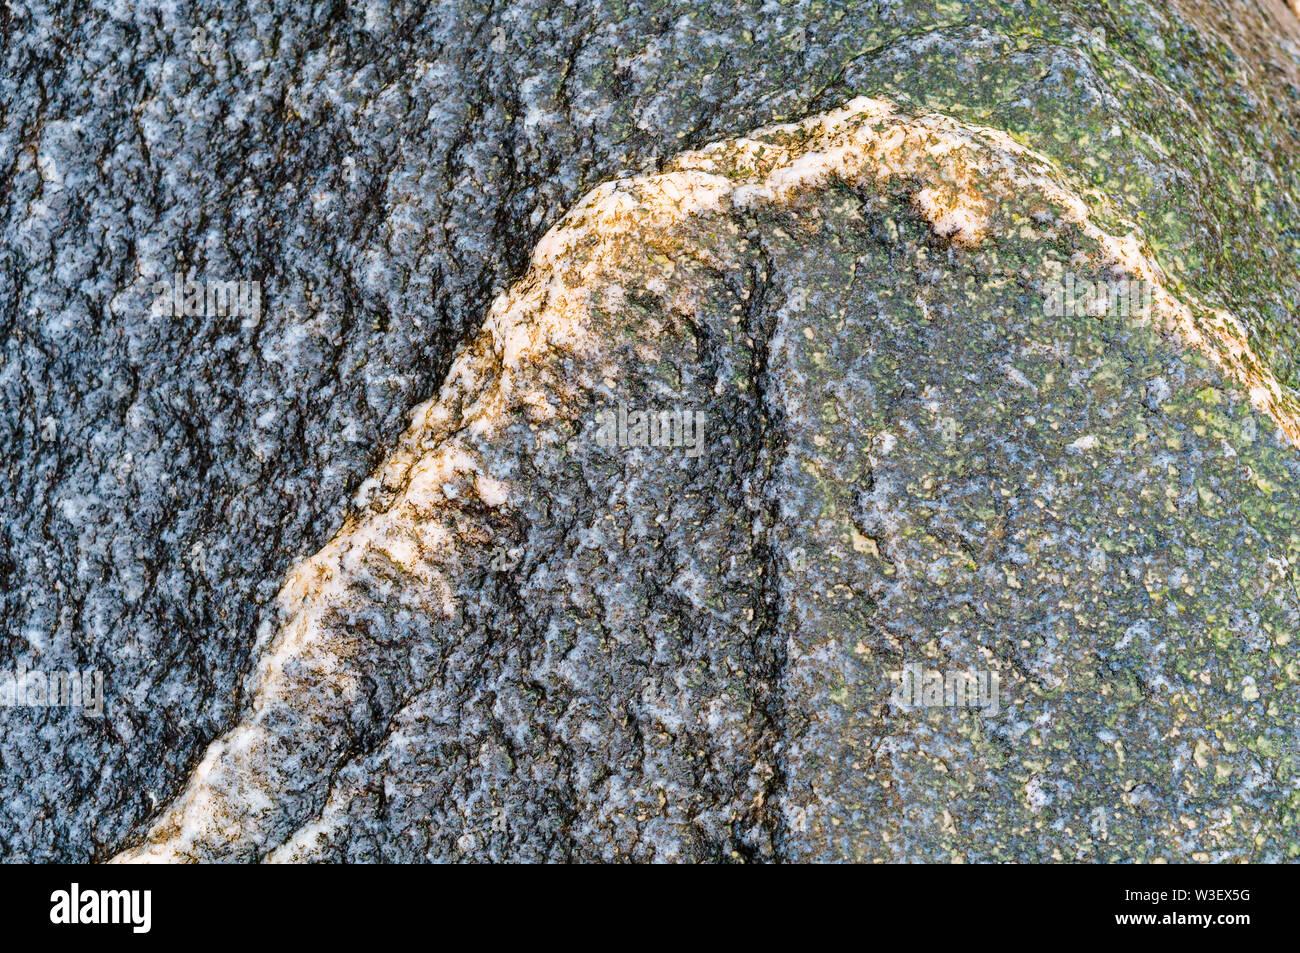 La texture de la pierre, de la mer pierre background Photo Stock